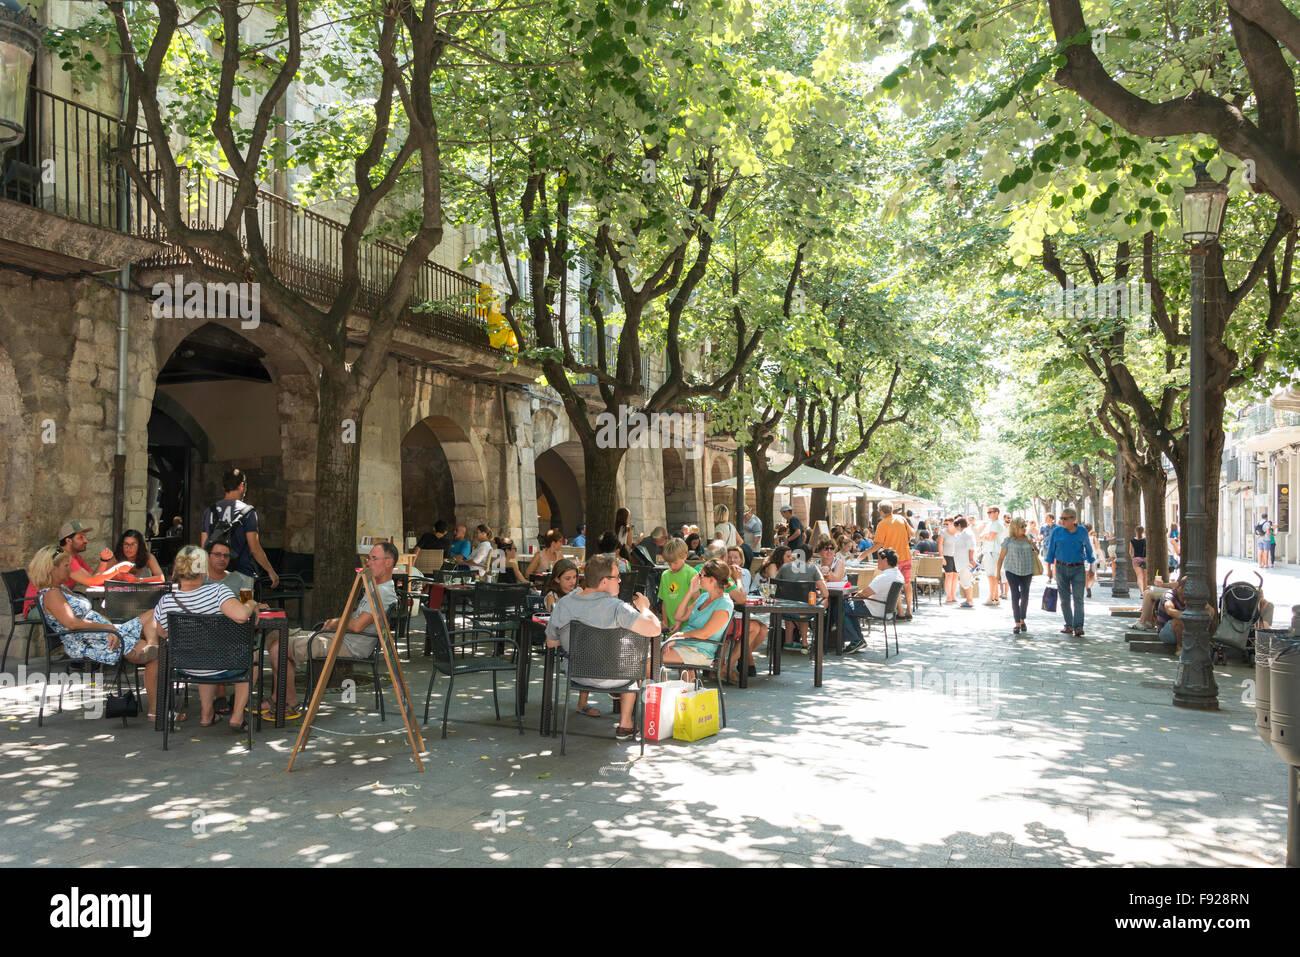 La Rambla de la Llibertat, Old Town, Girona (Gerona), Province of Girona, Catalonia, Spain - Stock Image